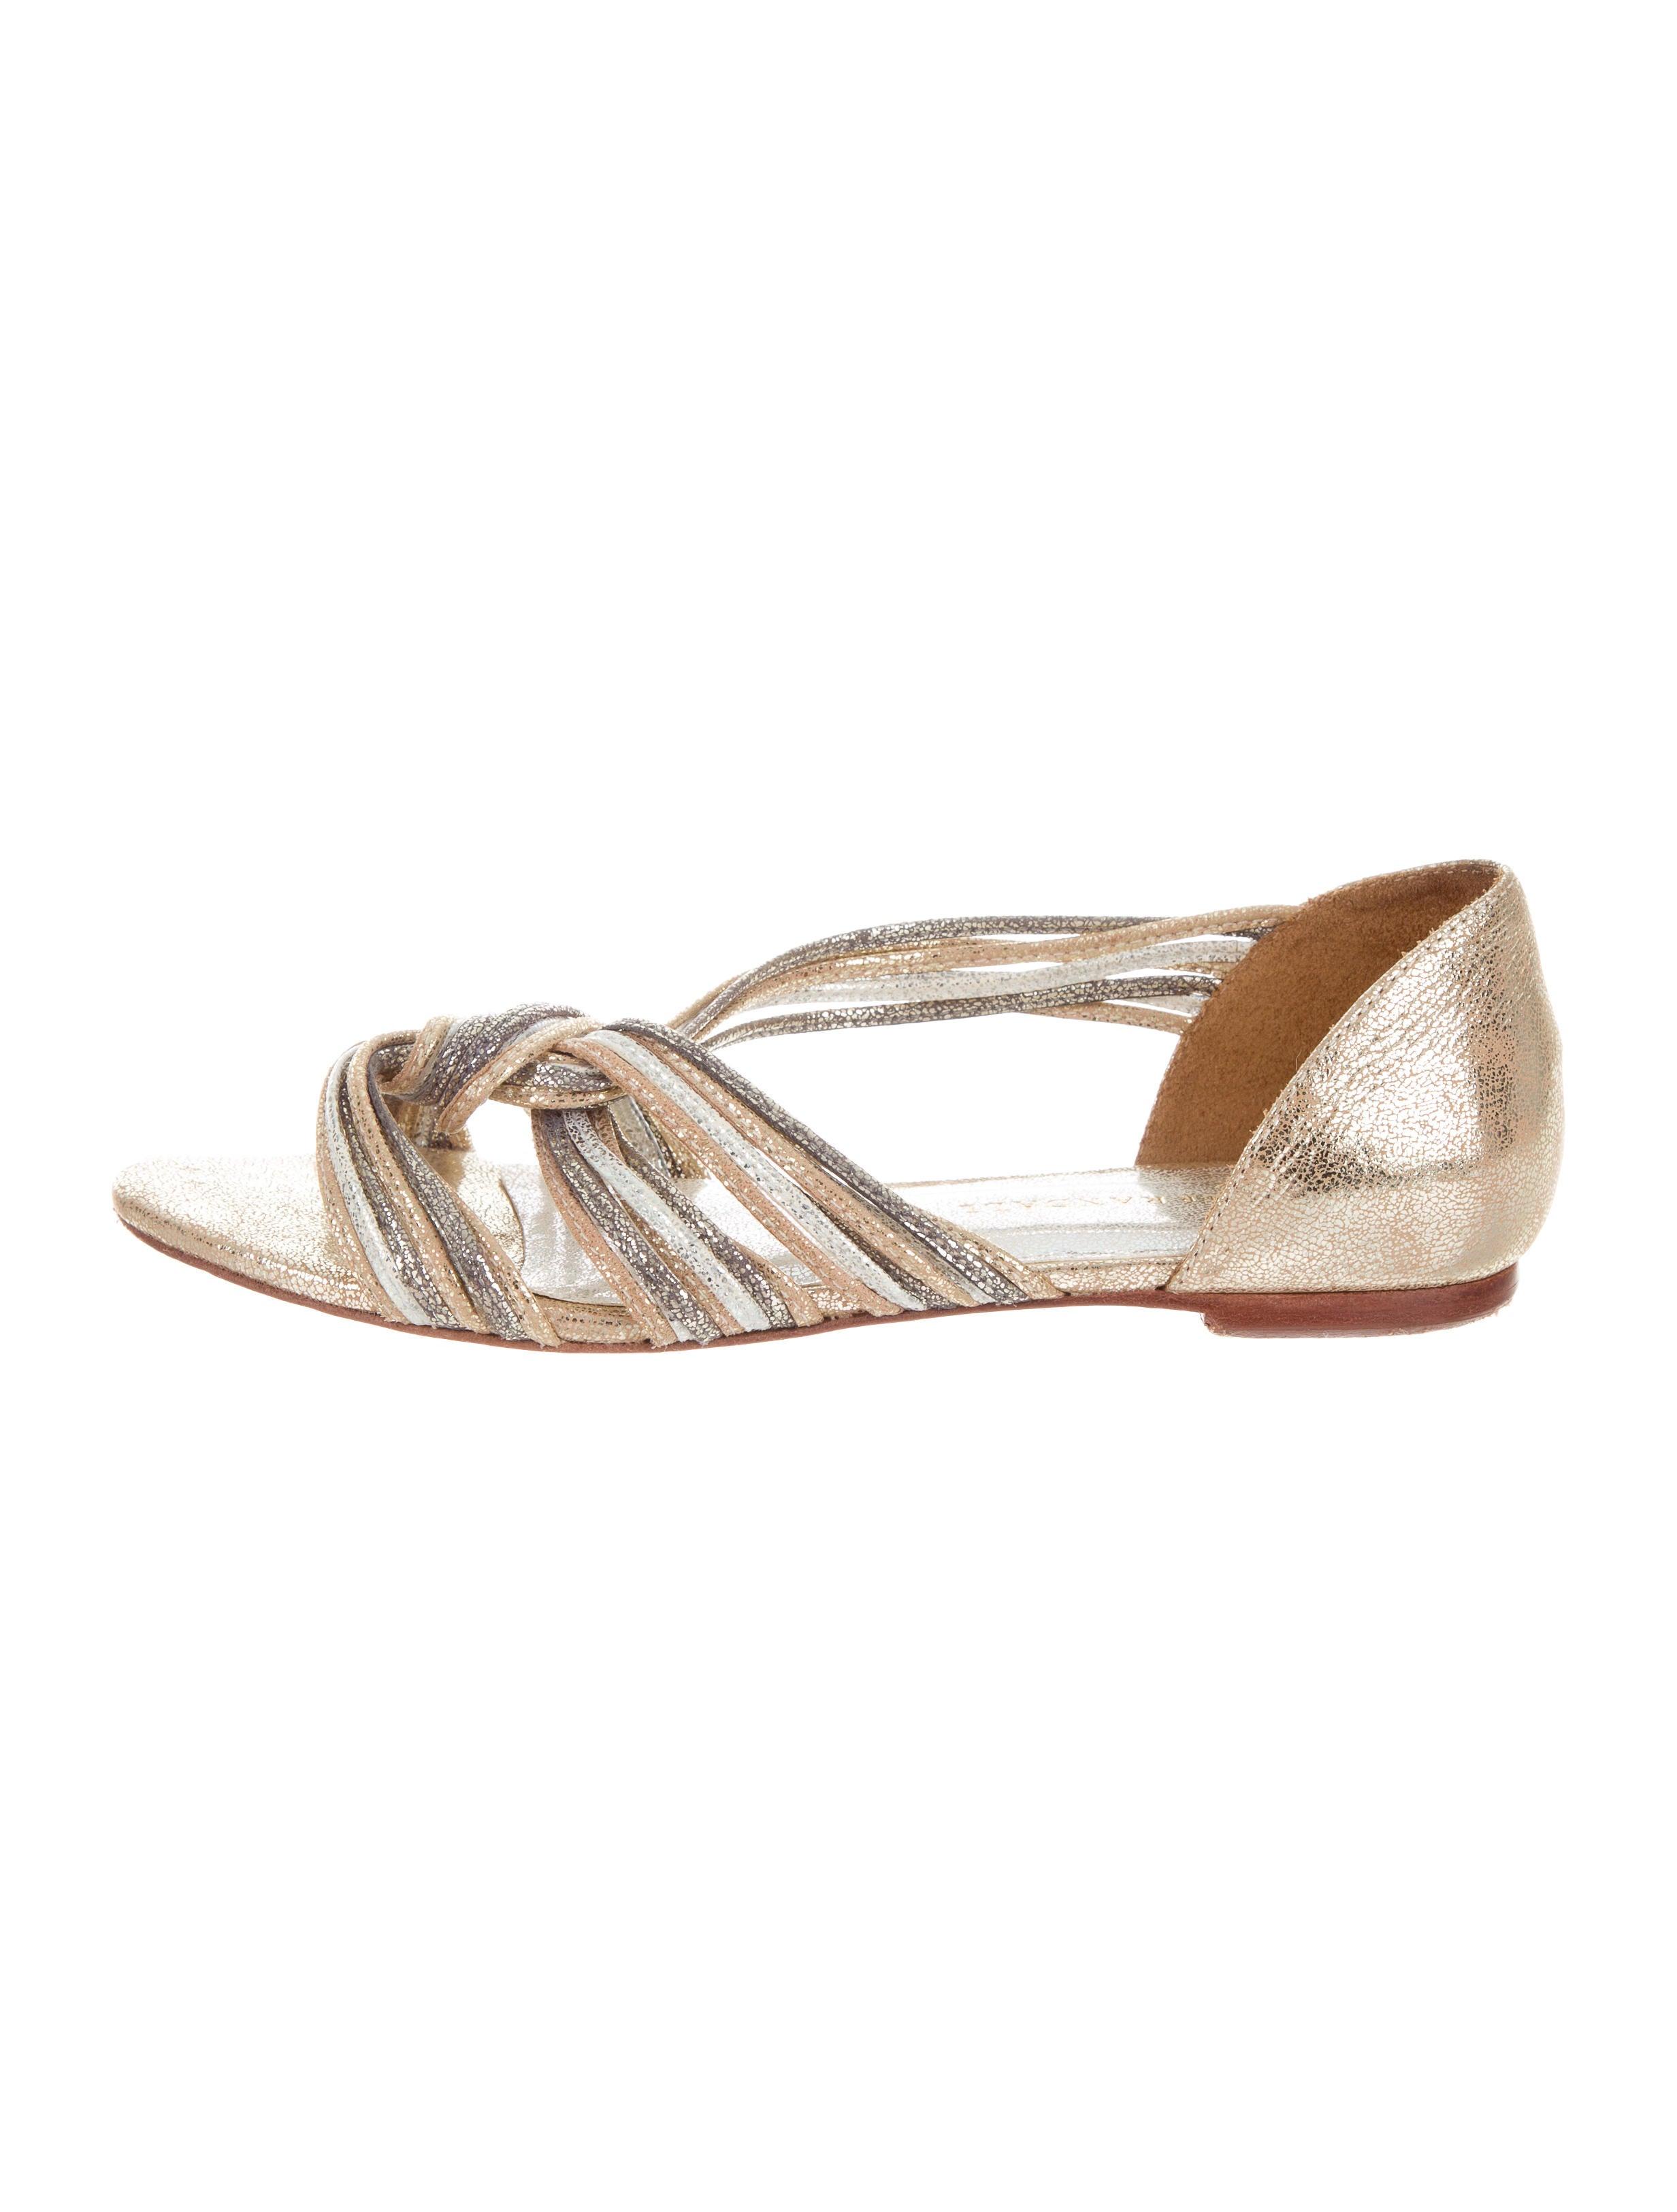 sale deals choice sale online Loeffler Randall Metallic Multistrap Sandals 42KBrB9Zb